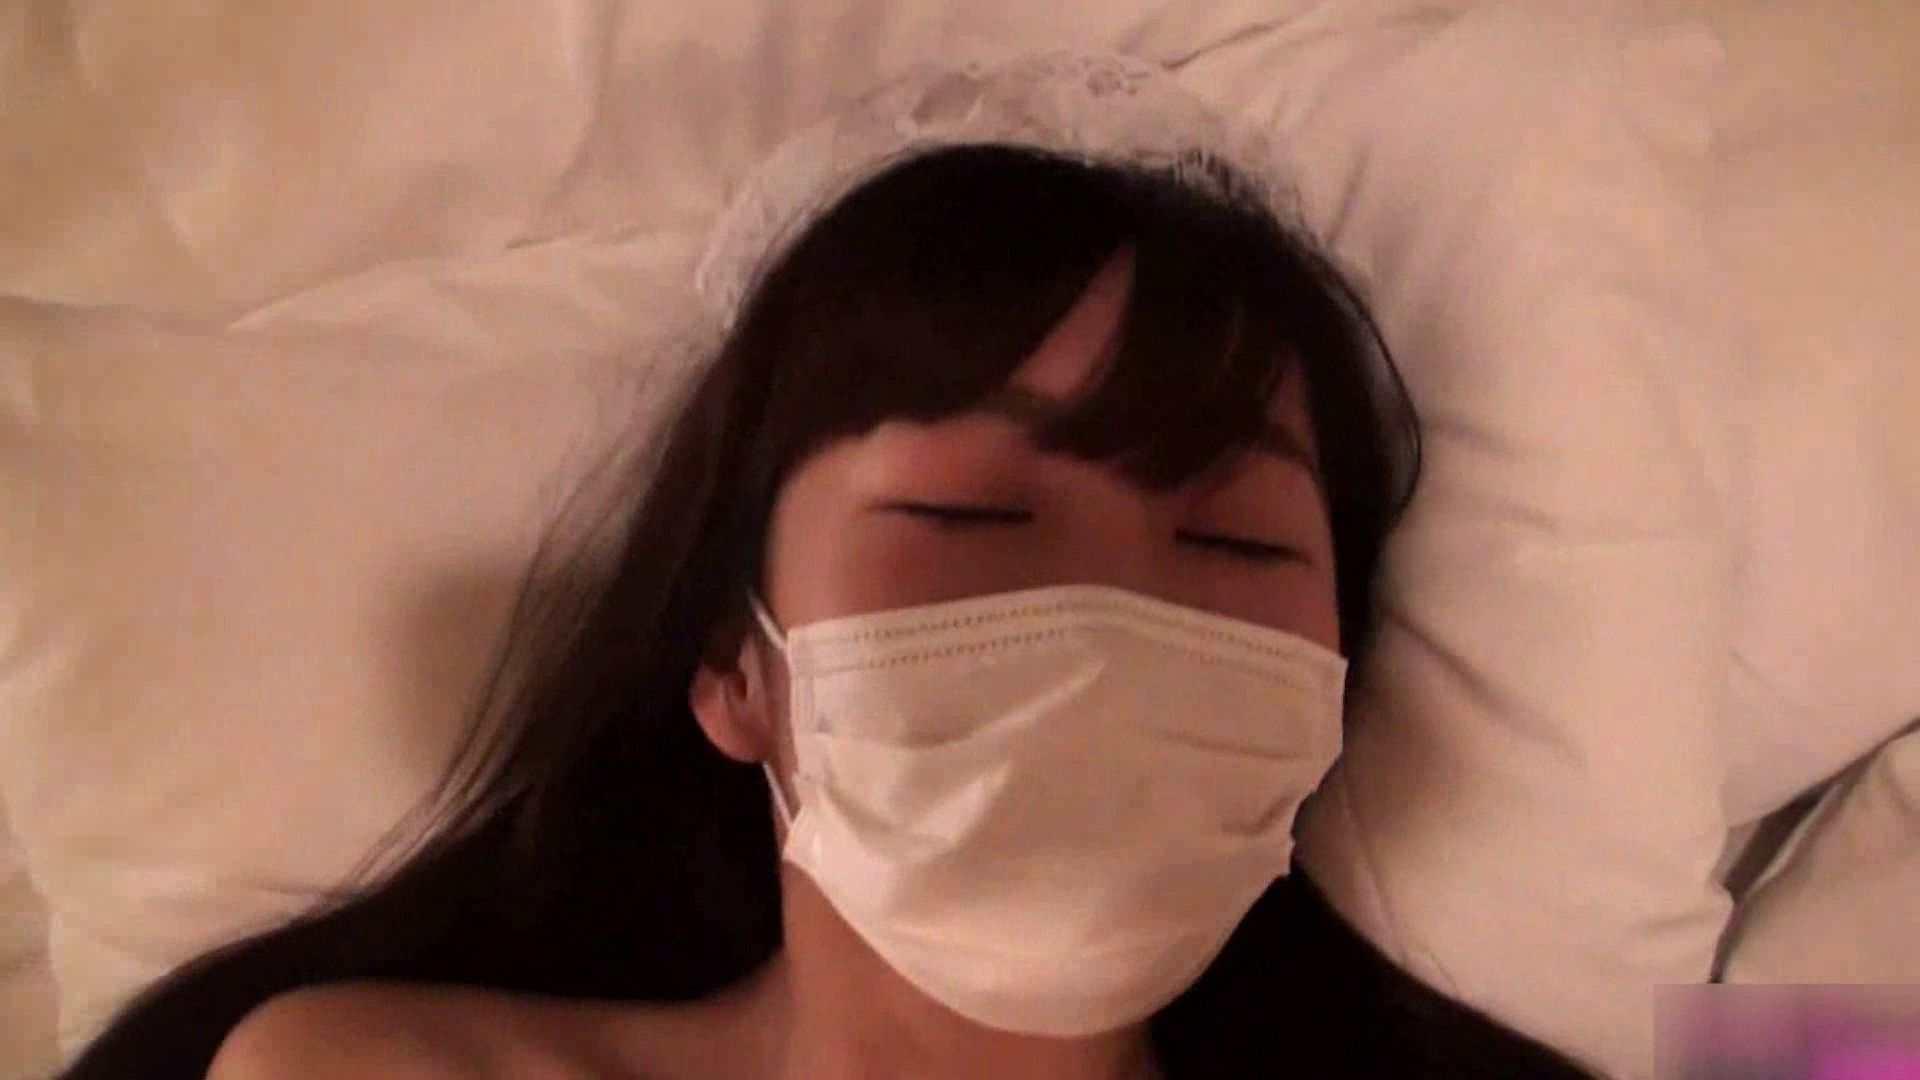 S級厳選美女ビッチガールVol.23 SEX本番 ワレメ無修正動画無料 105画像 19